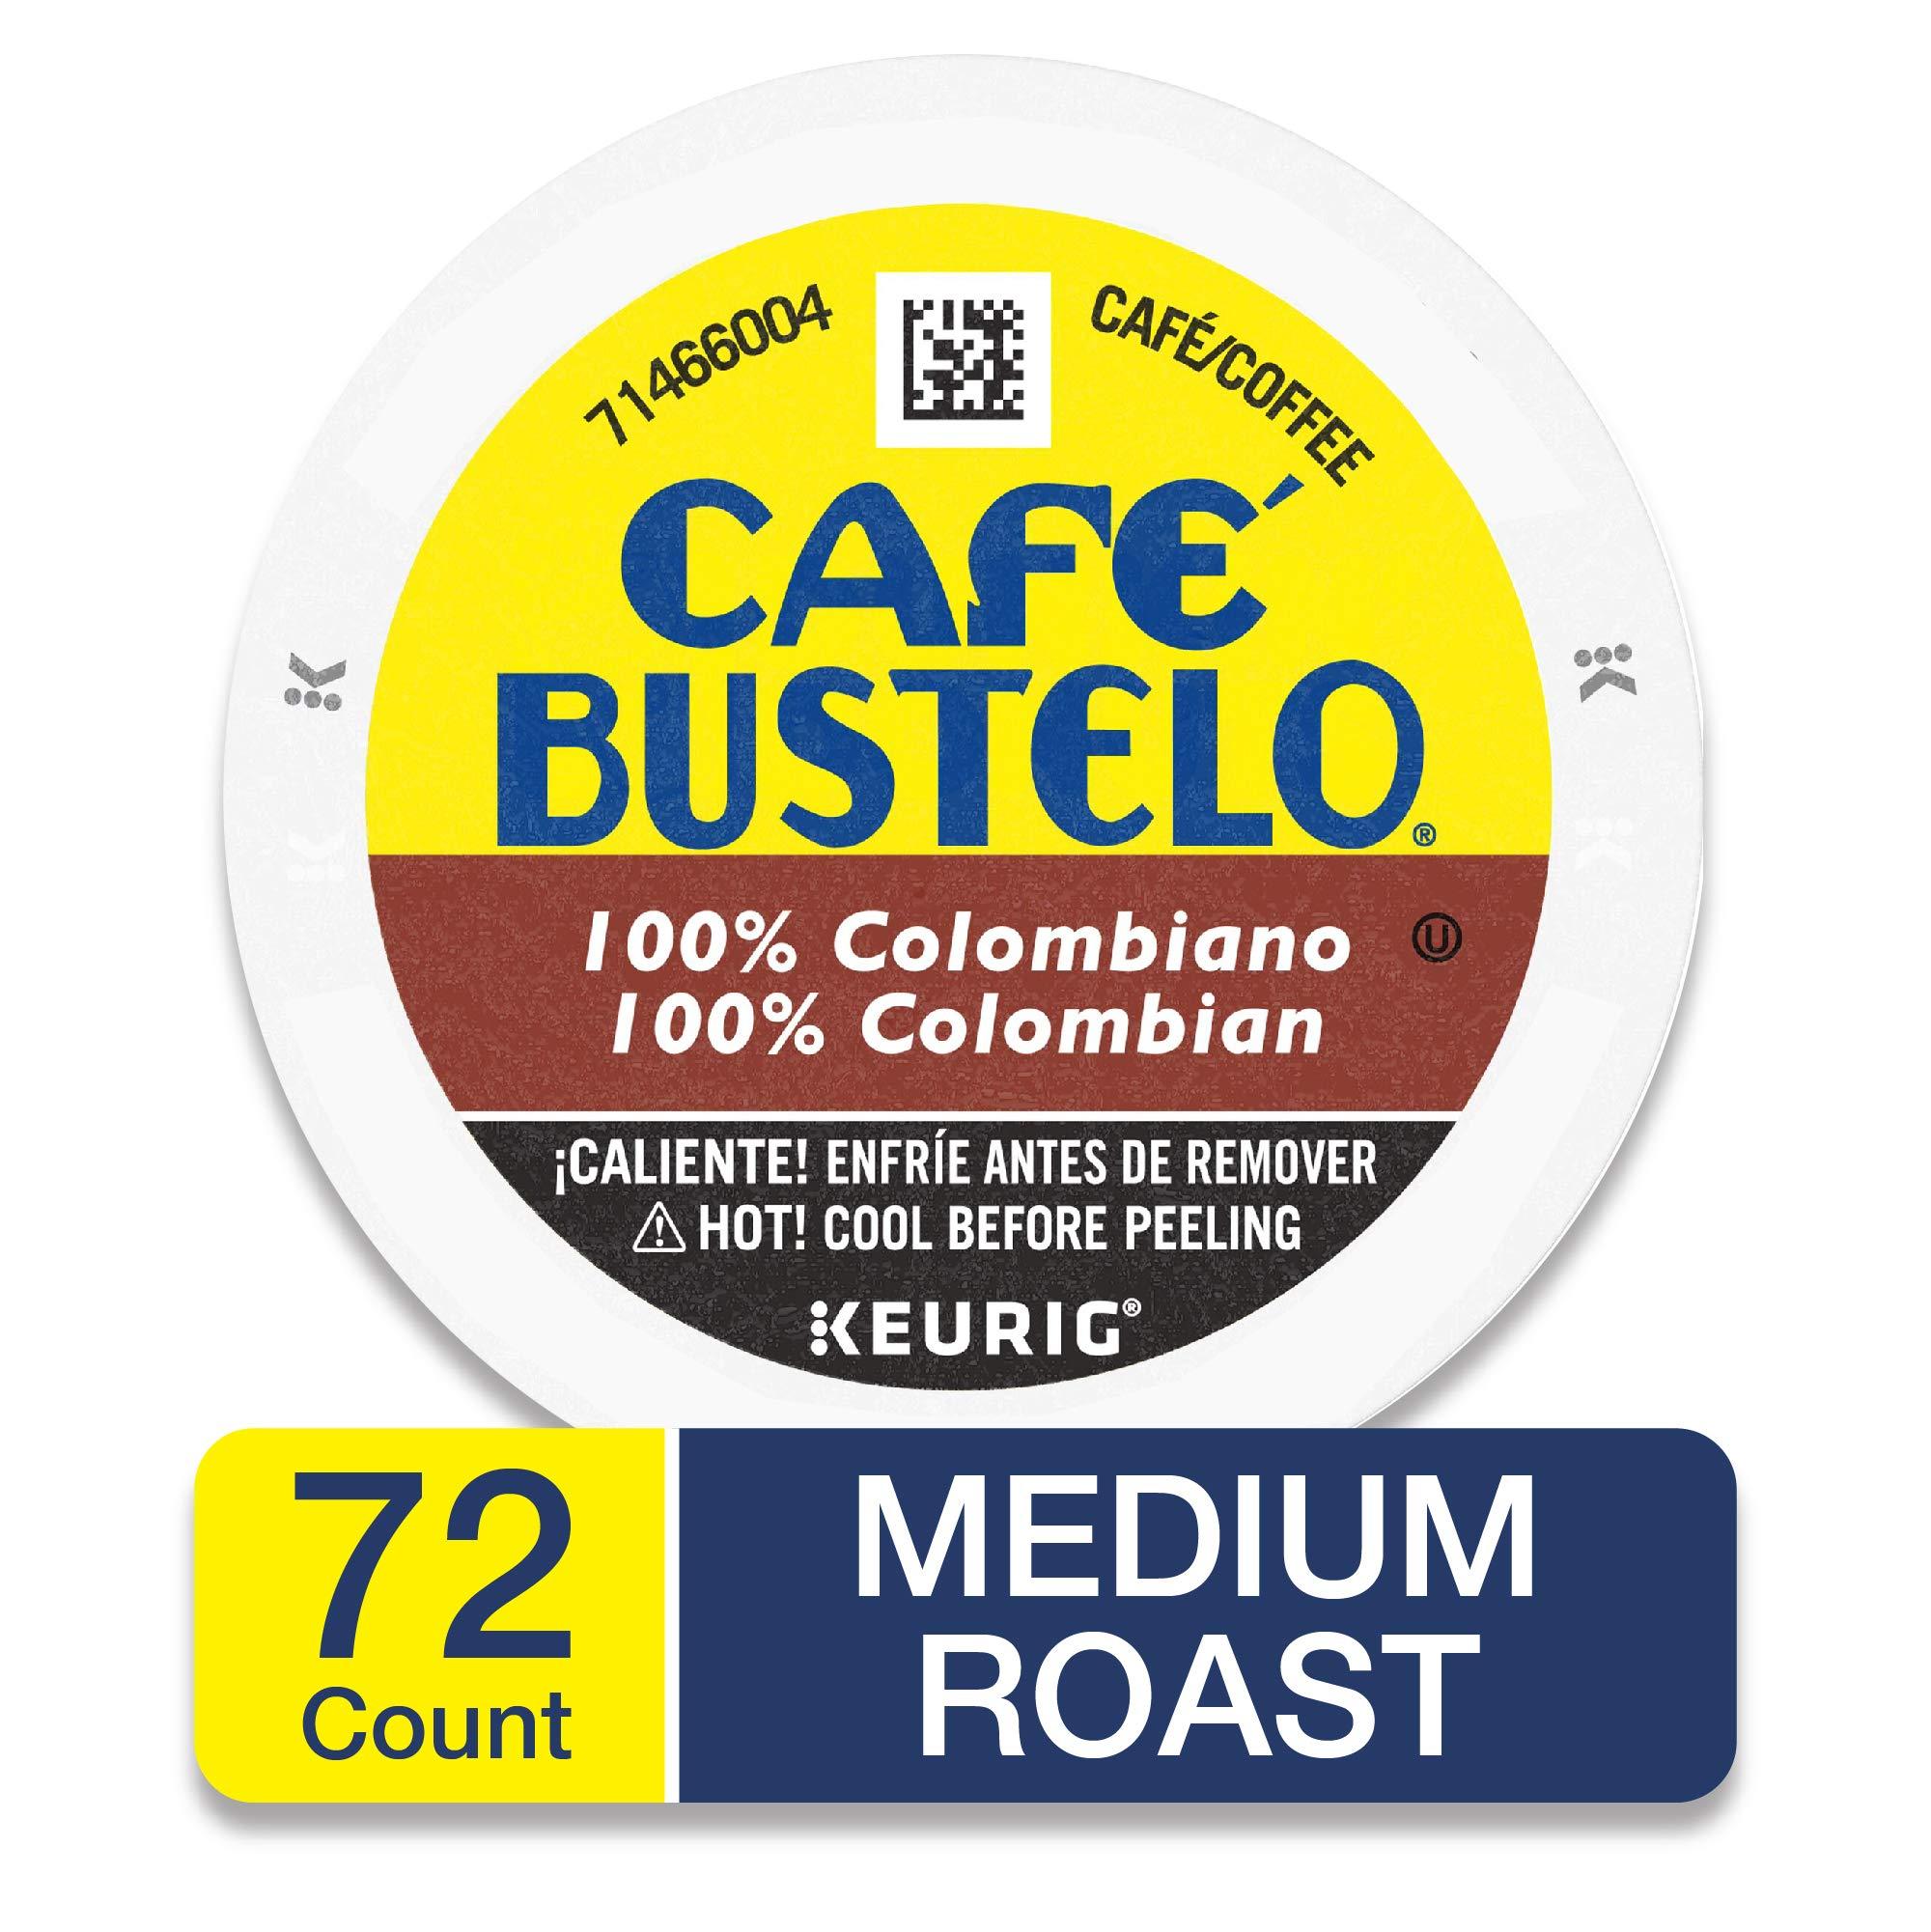 Café Bustelo 100% Colombian Medium Roast Coffee, 72 K Cups for Keurig Makers by Café Bustelo